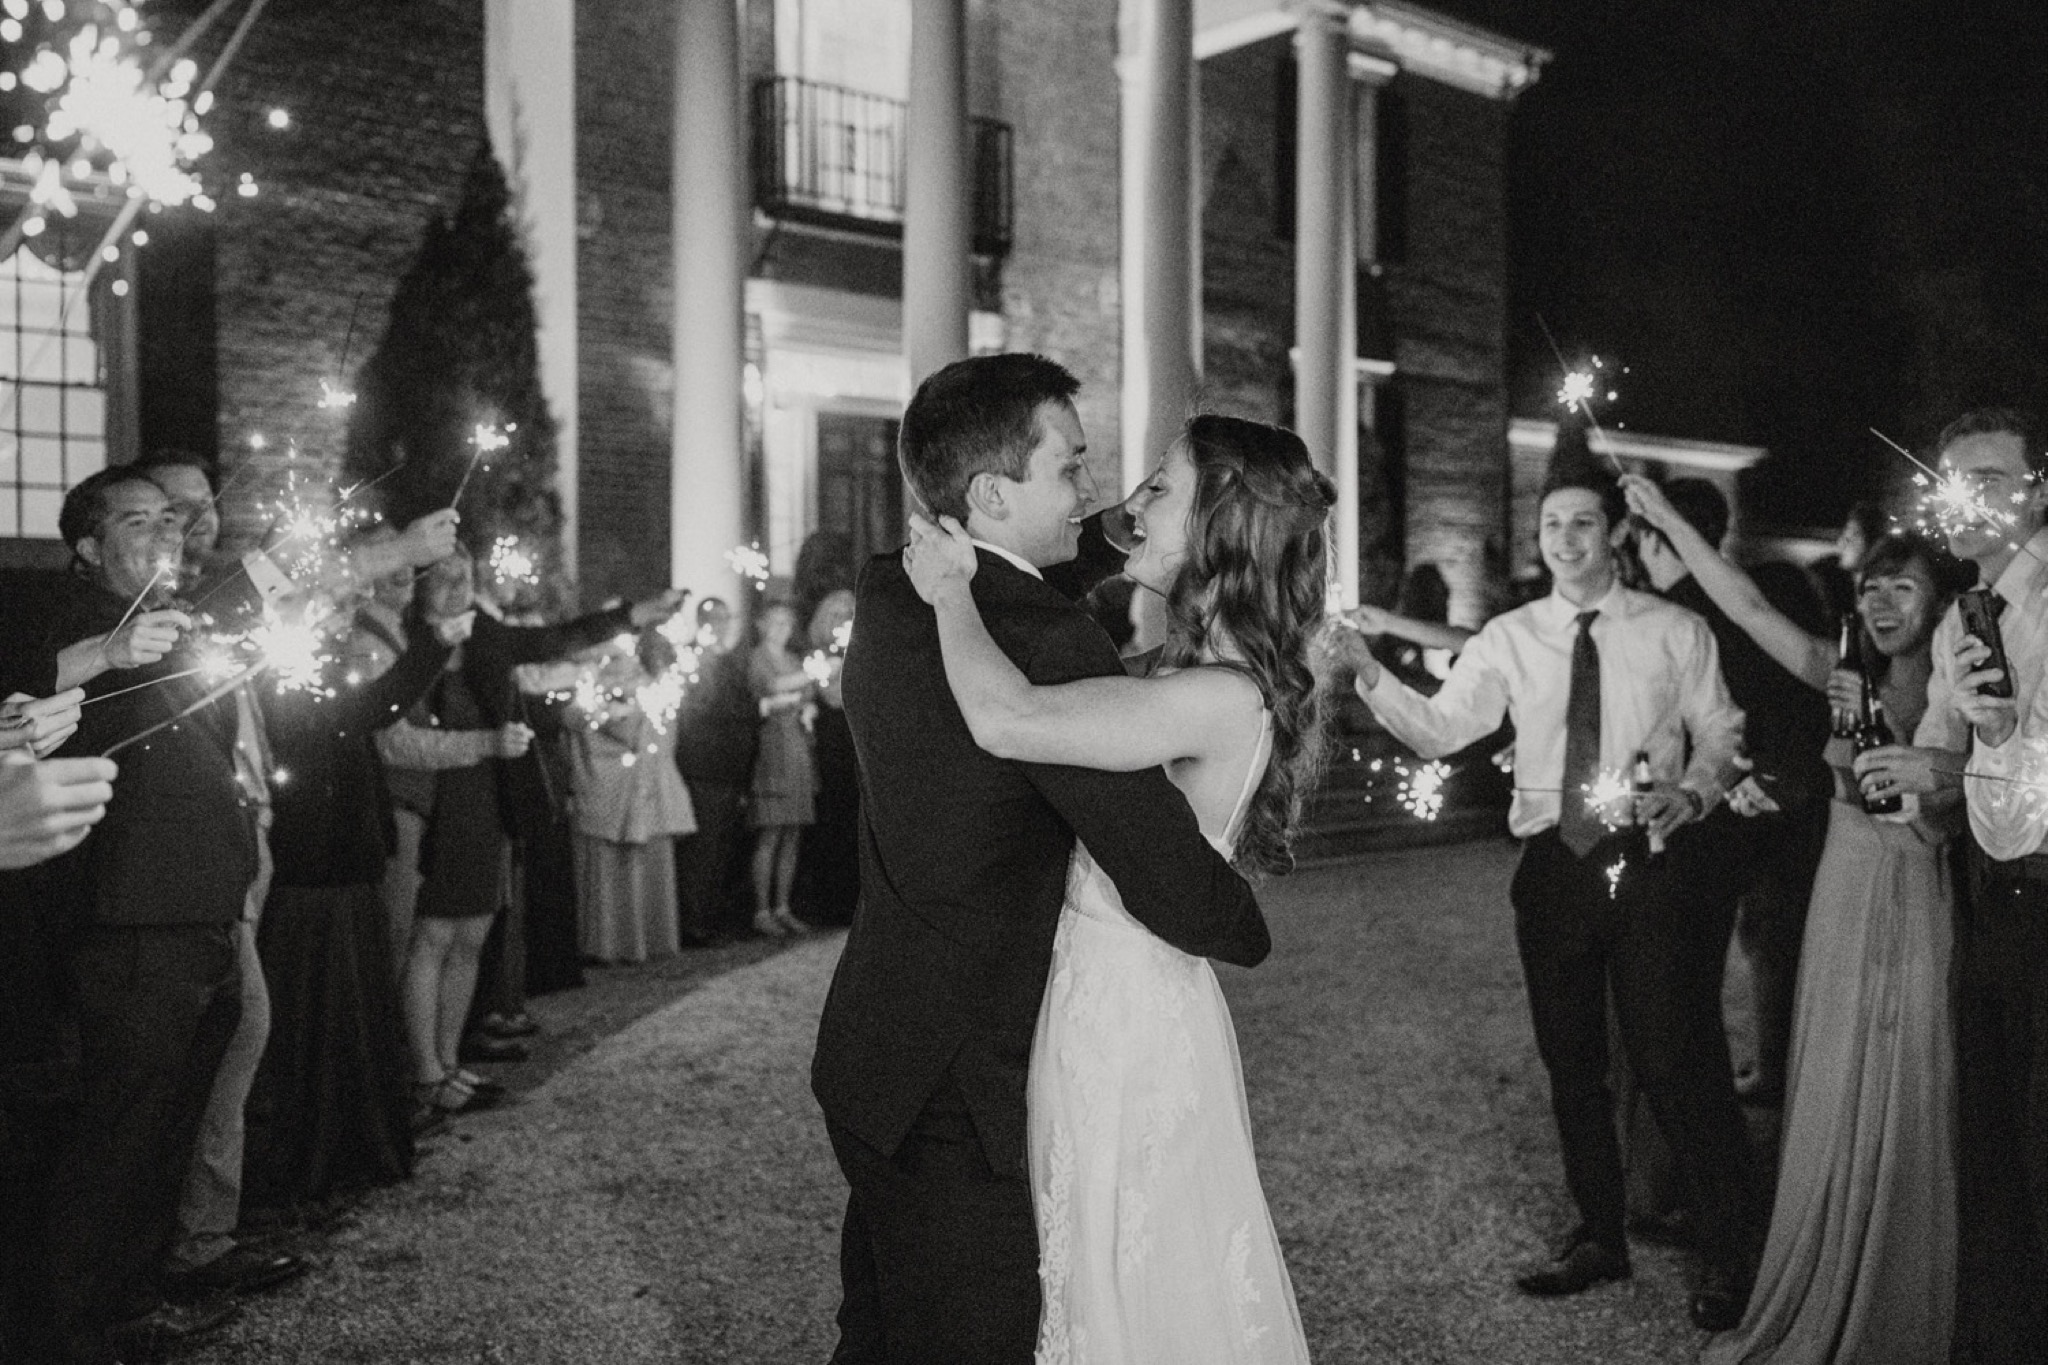 94_West Manor Estate Weddings - Pat Cori Photography-219_Sparklerexit_VirginiaWeddingPhotographer_WestManorEstate_Weddingvenue_Virginia.jpg